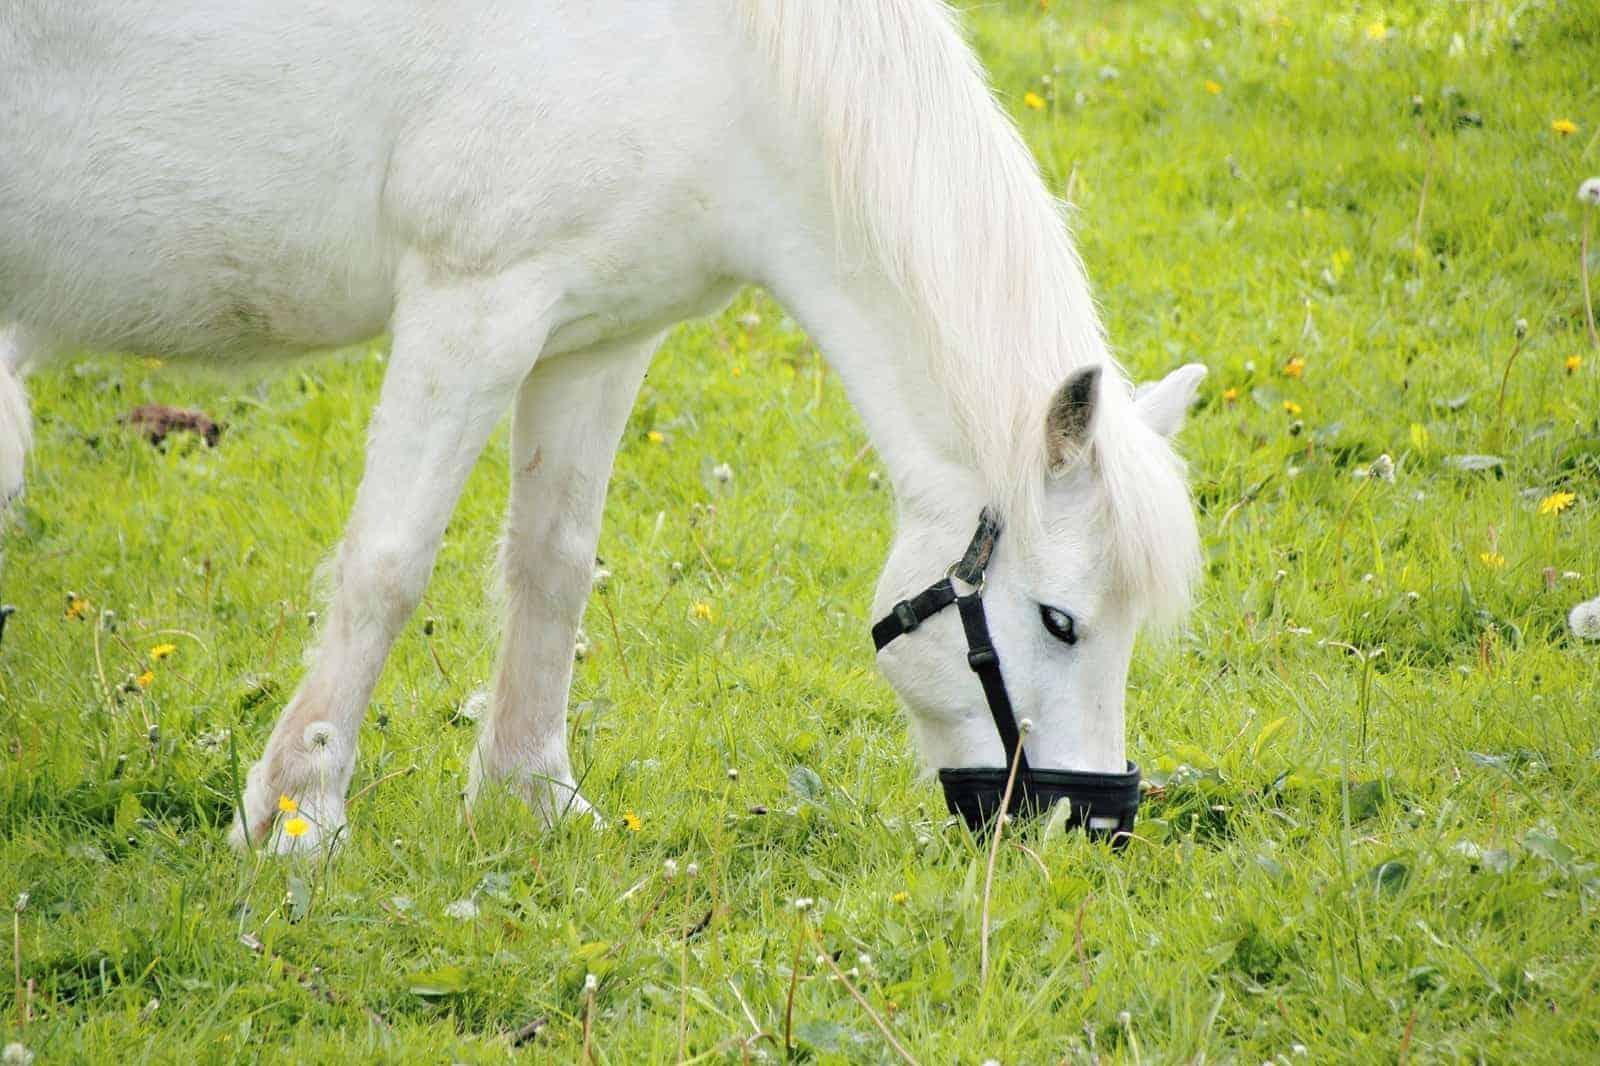 Laminitis Survivors: Getting Back on Grass